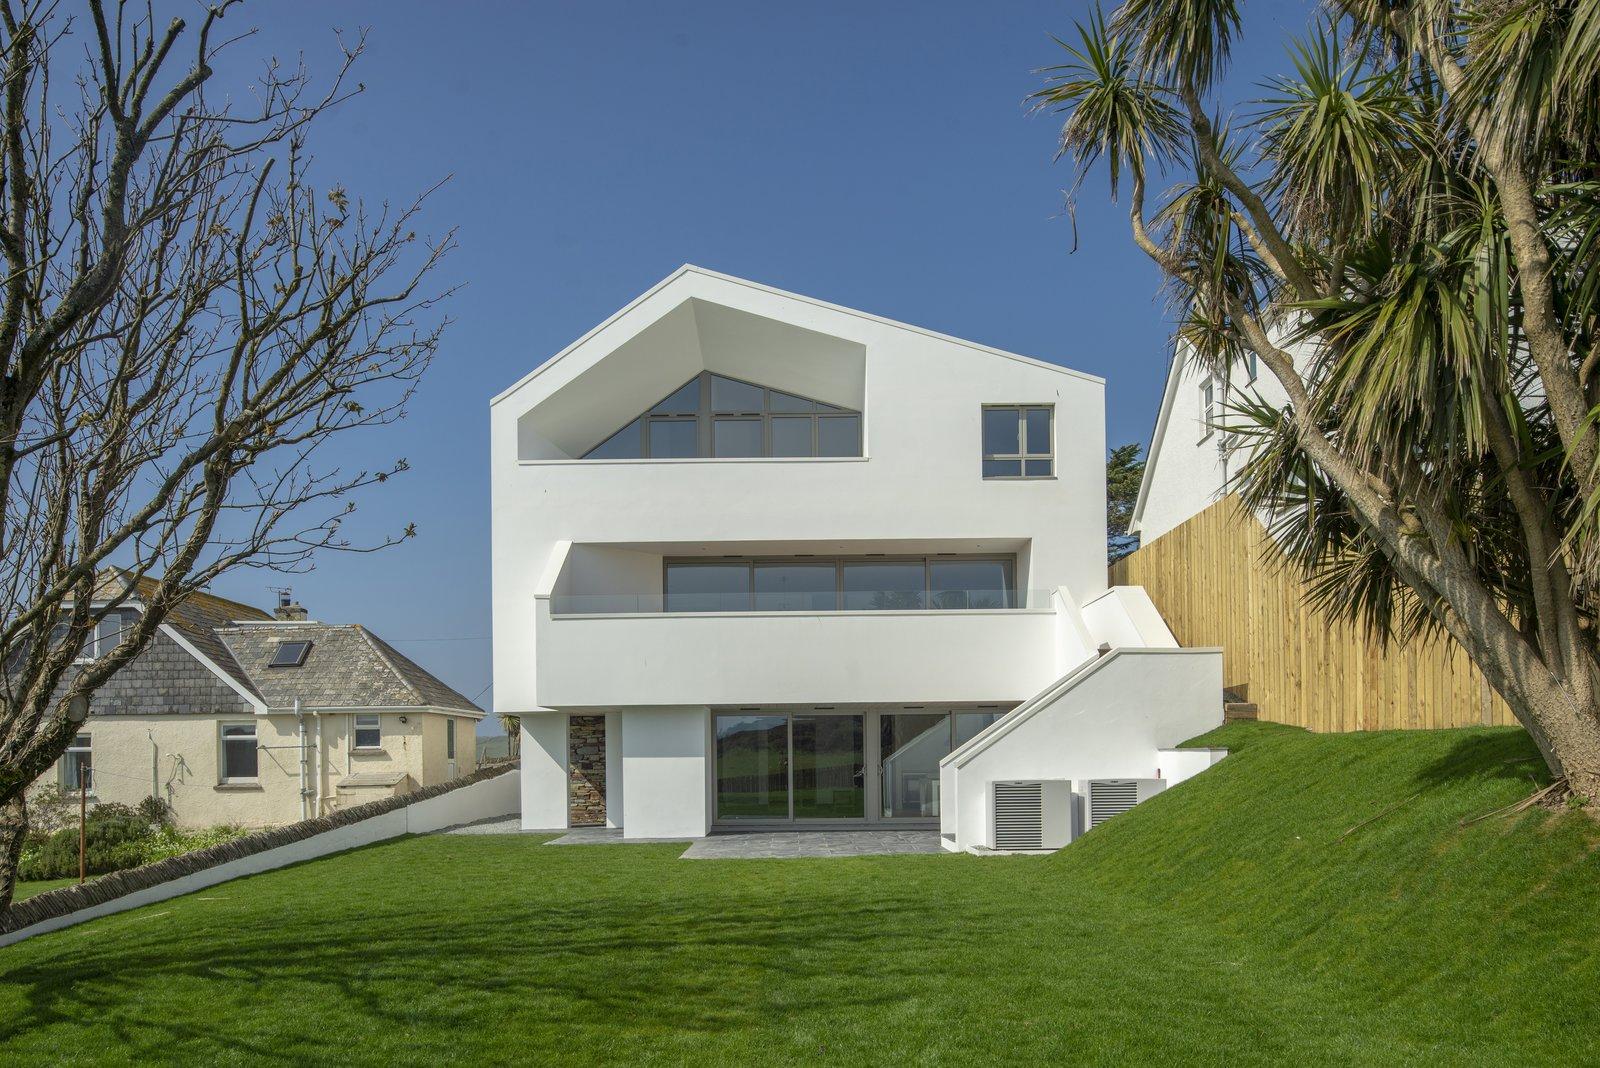 A UK Home With Panoramic Ocean Vistas Asks $3.5M